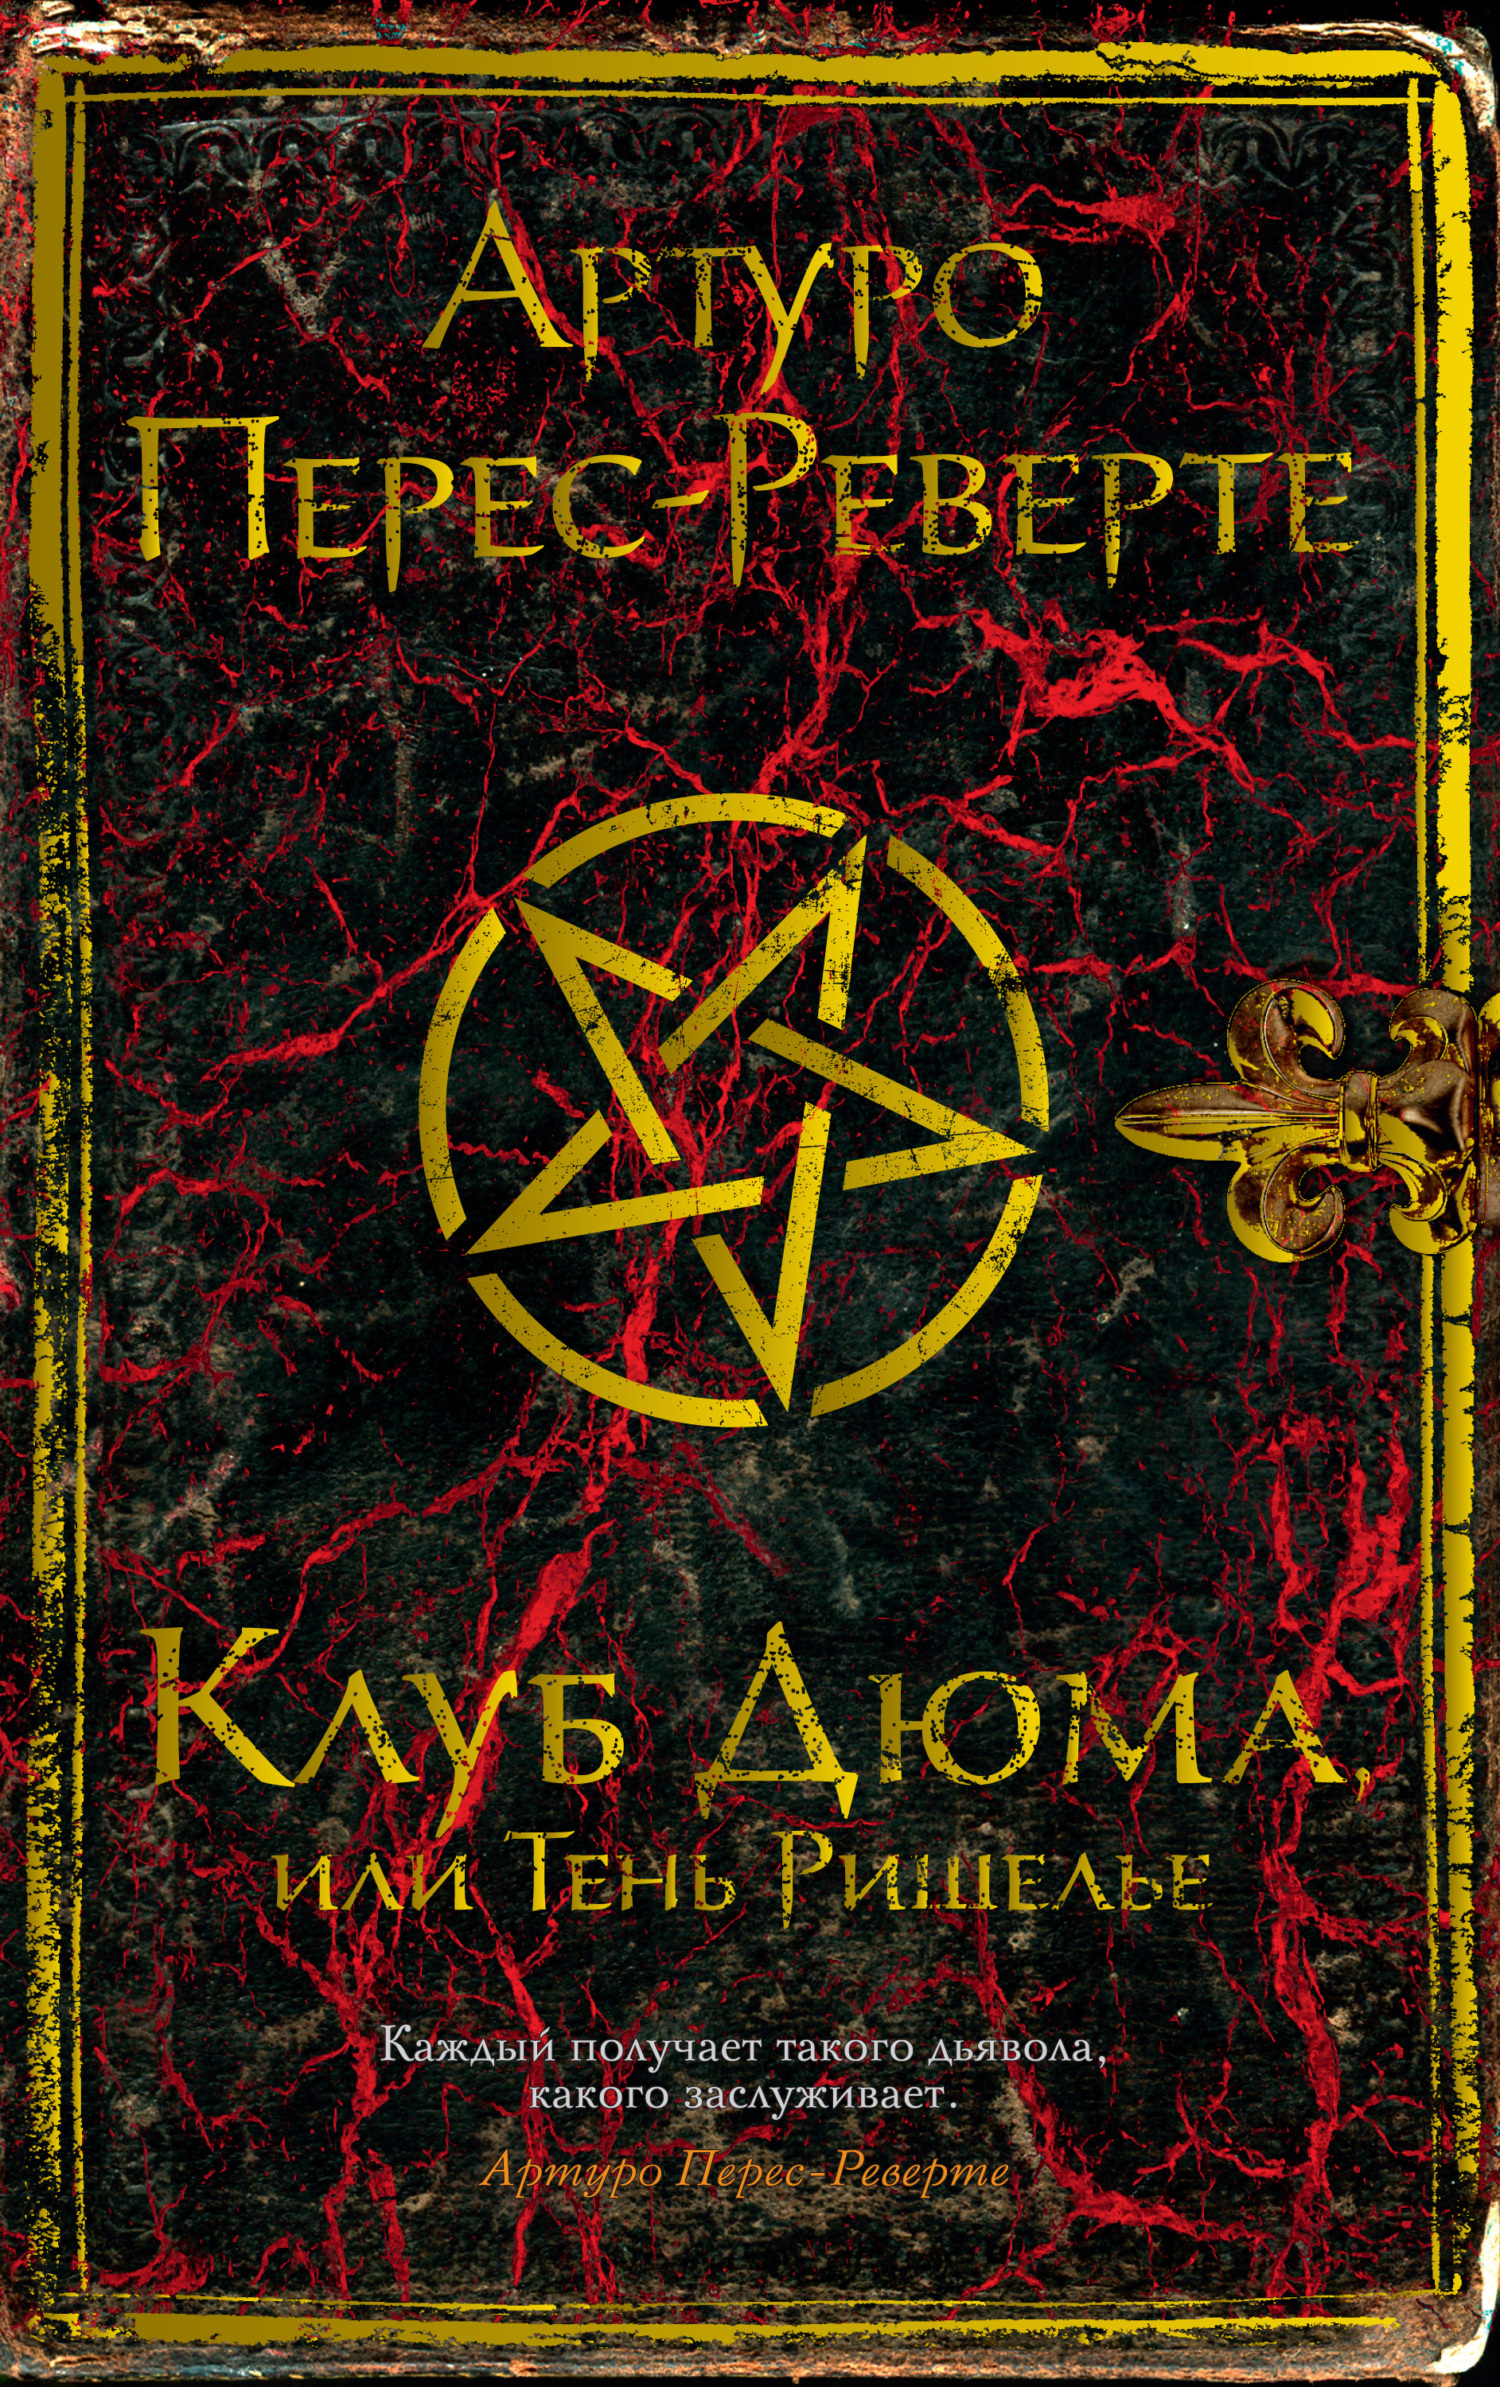 Электронная книга «Клуб Дюма, или Тень Ришелье» – Артуро Перес-Реверте